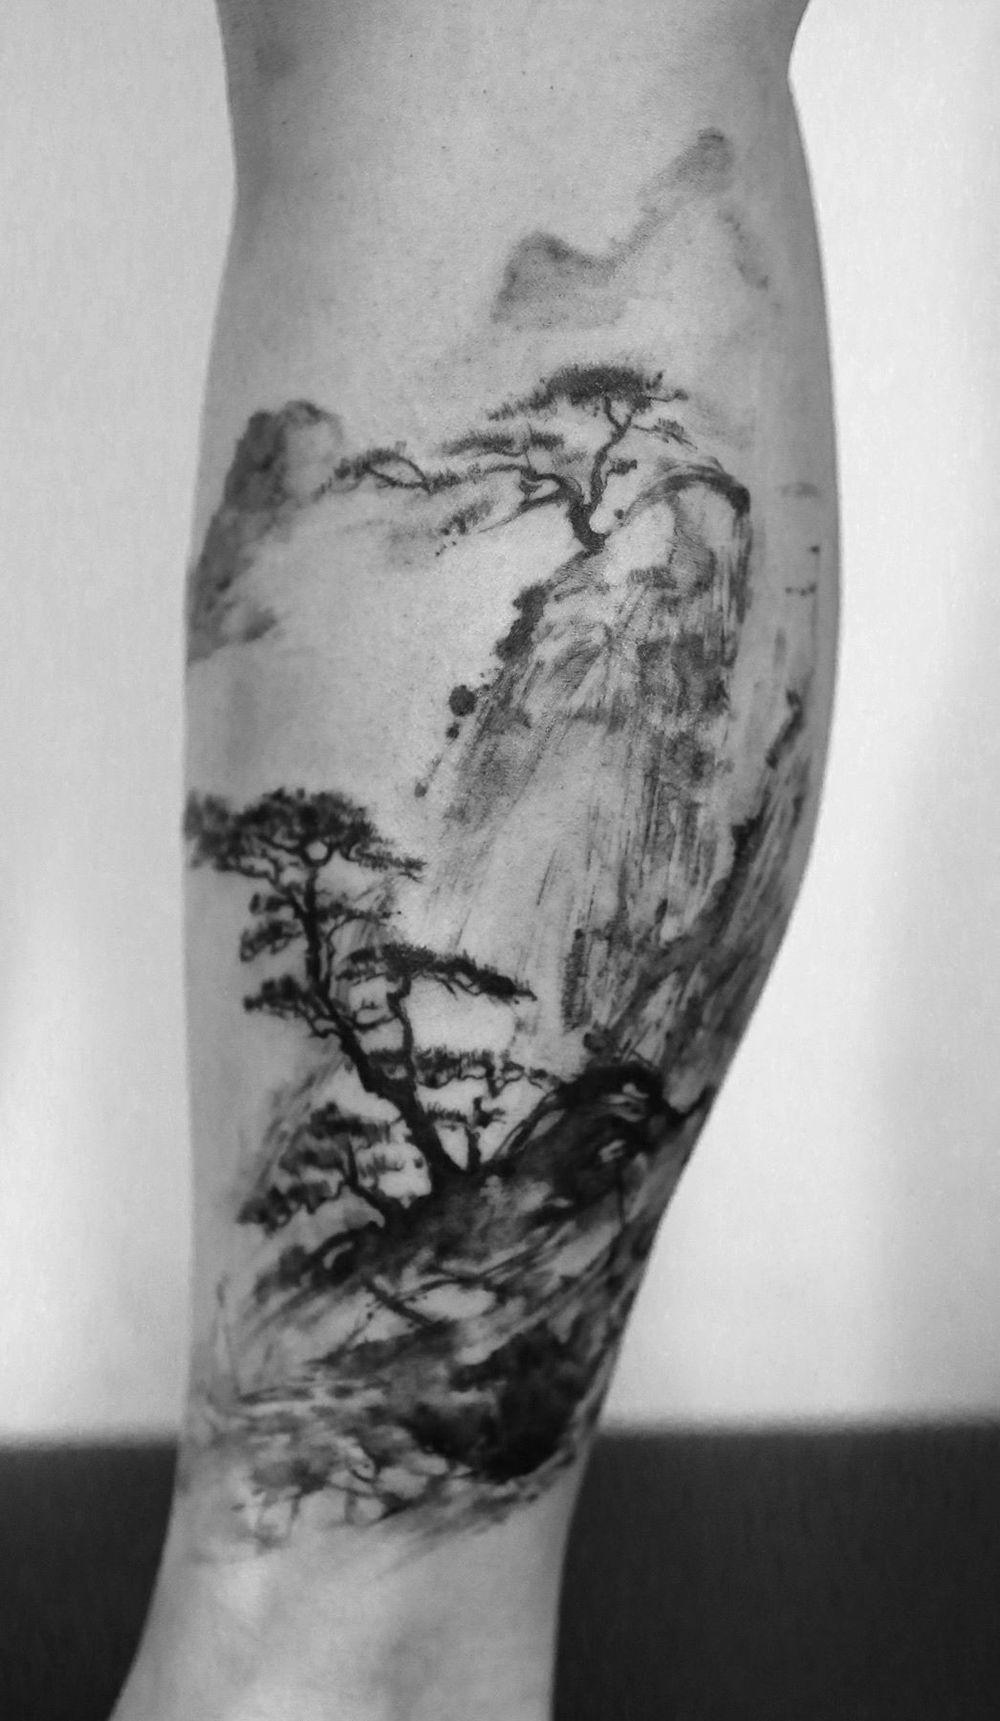 Related Image Painting Tattoo Bonsai Tattoo Tattoos